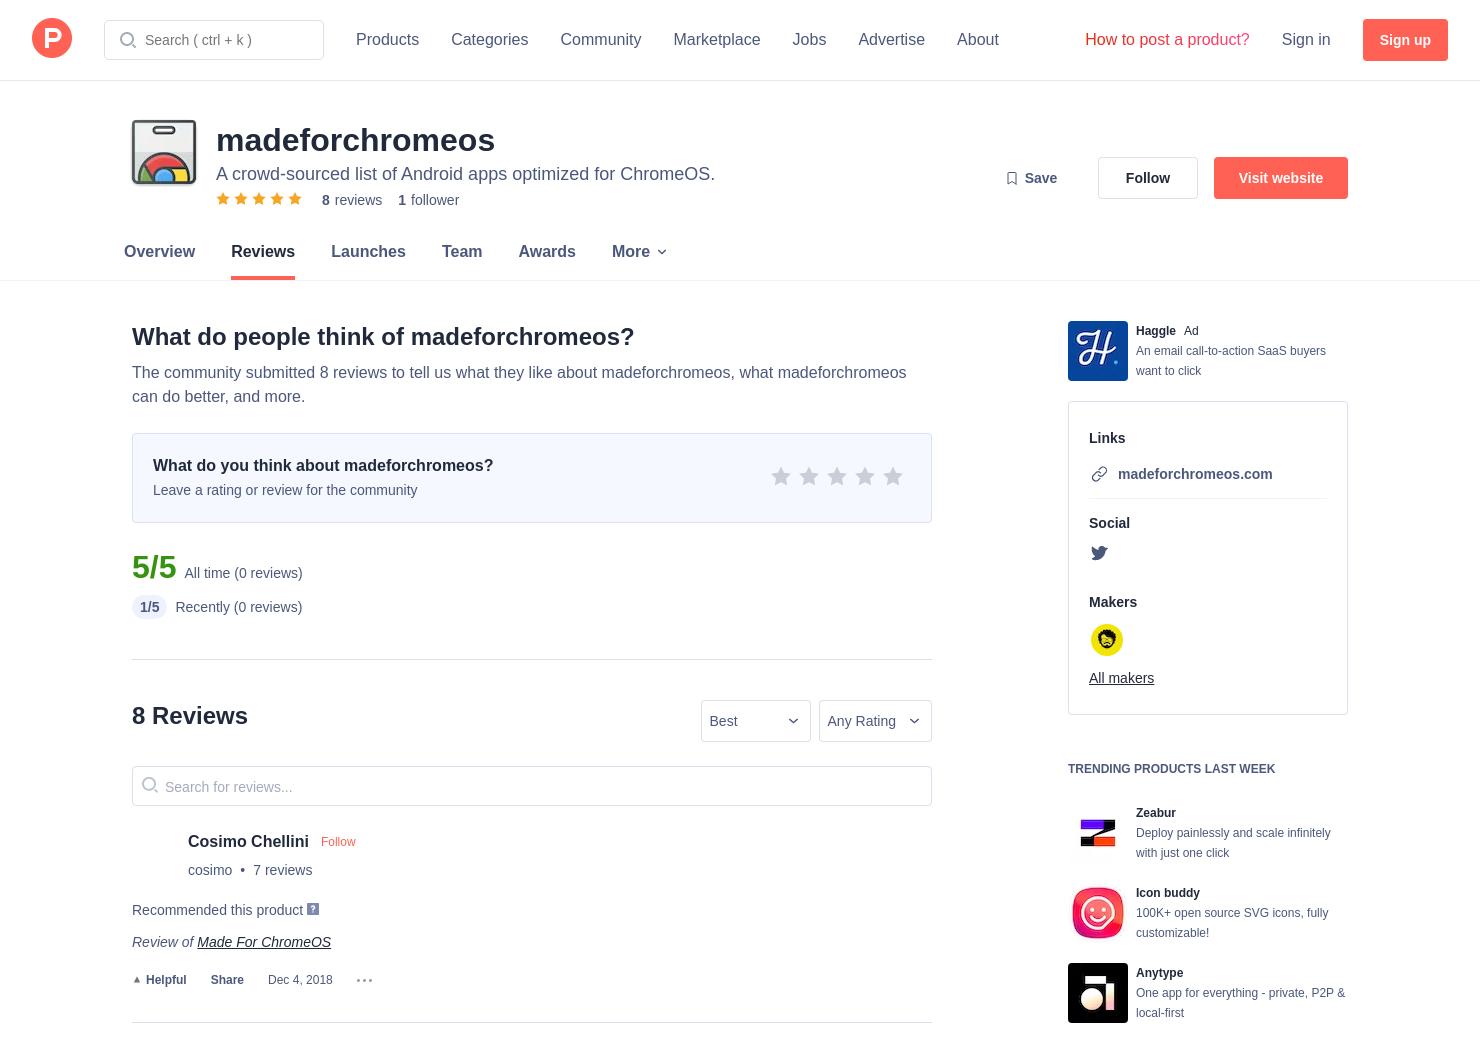 8 Made For ChromeOS Reviews - Pros, Cons and Rating